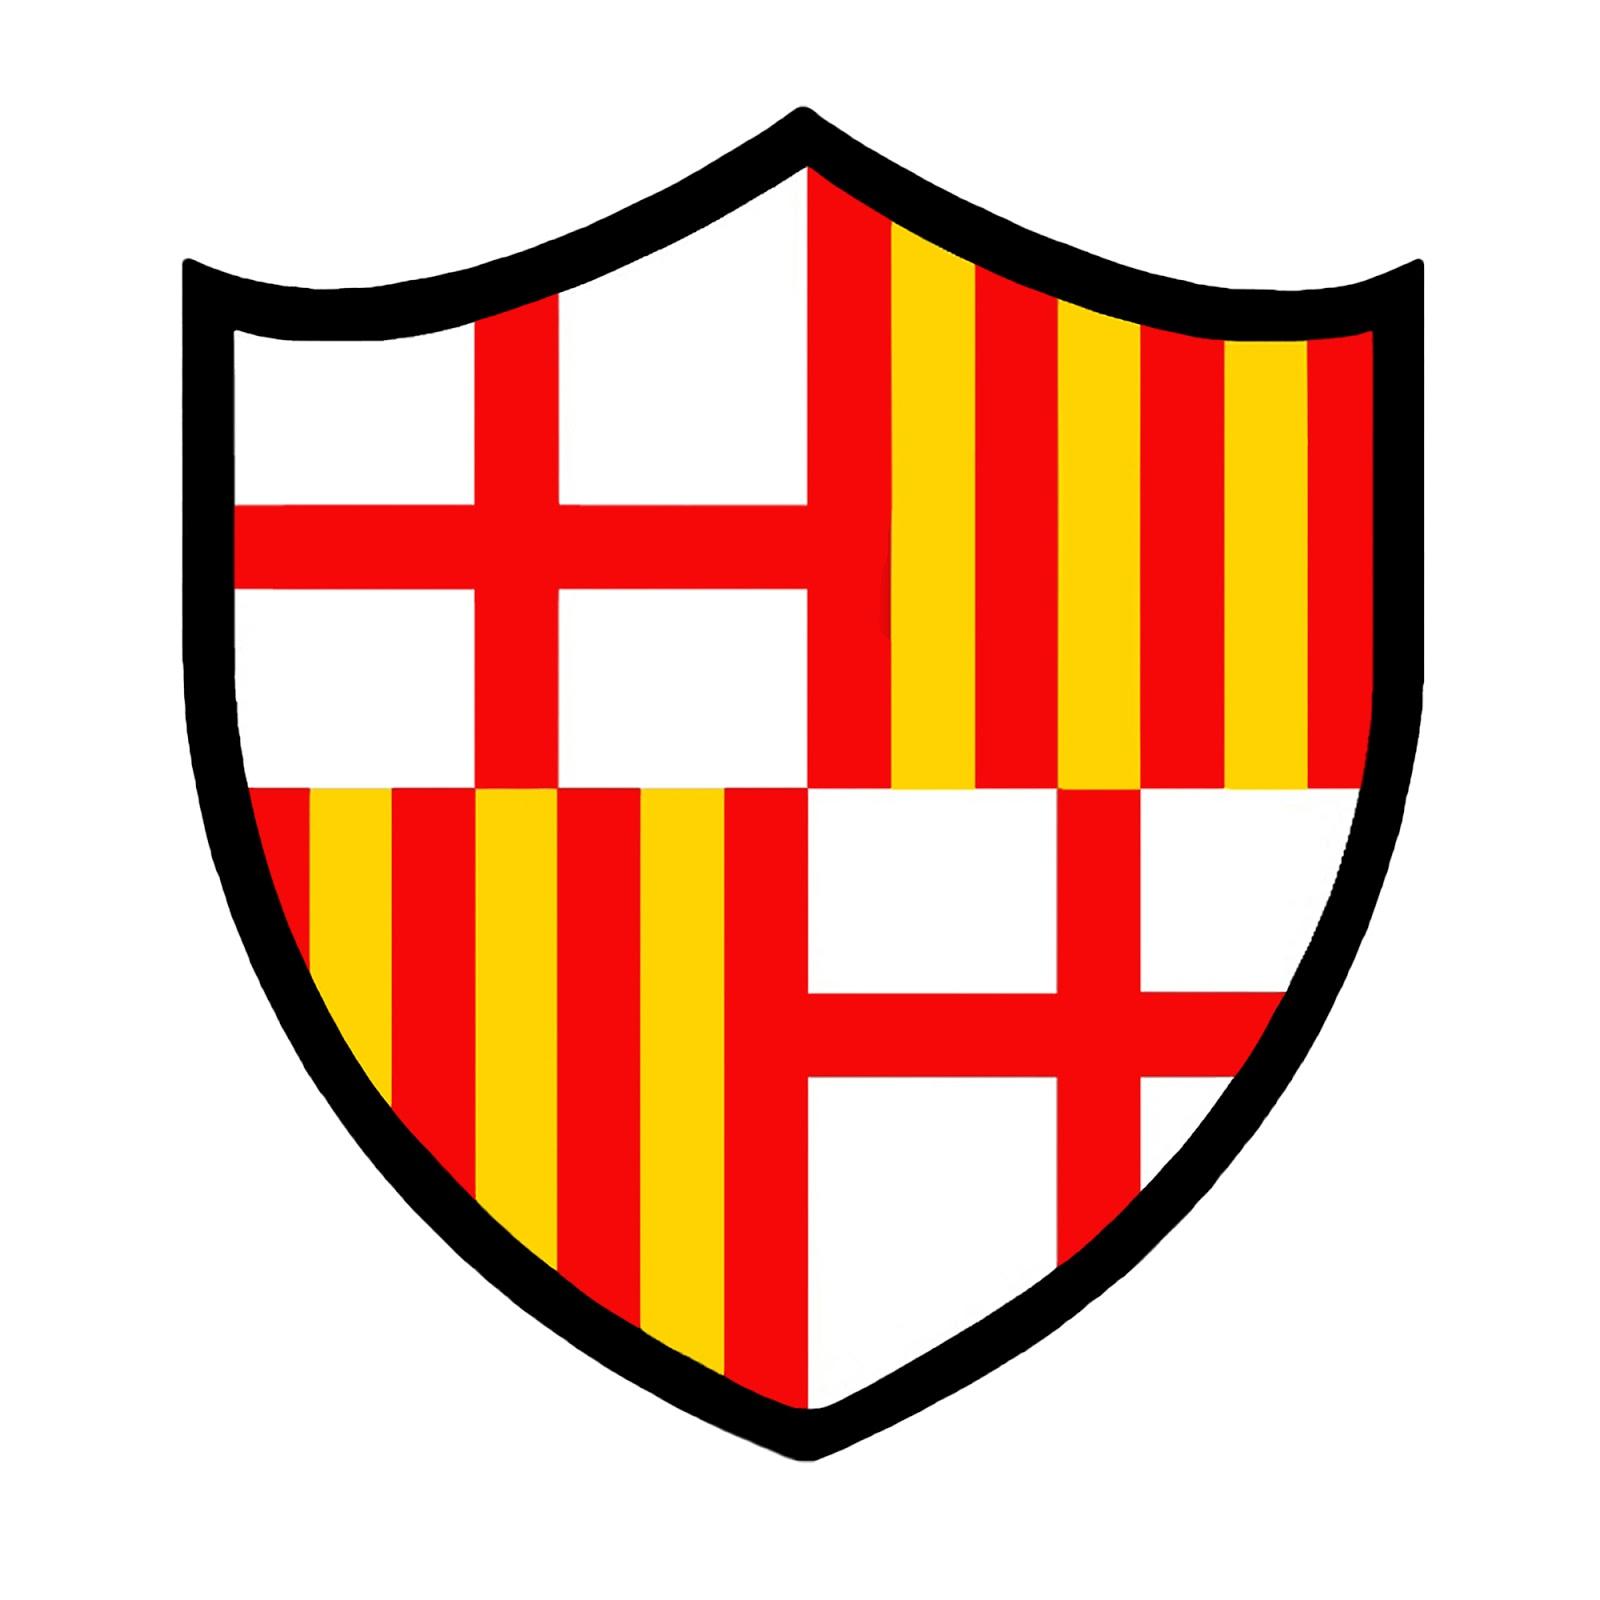 https://upload.wikimedia.org/wikipedia/commons/b/b6/Primer_Escudo_de_Barcelona_Sporting_Club_de_1925.jpg